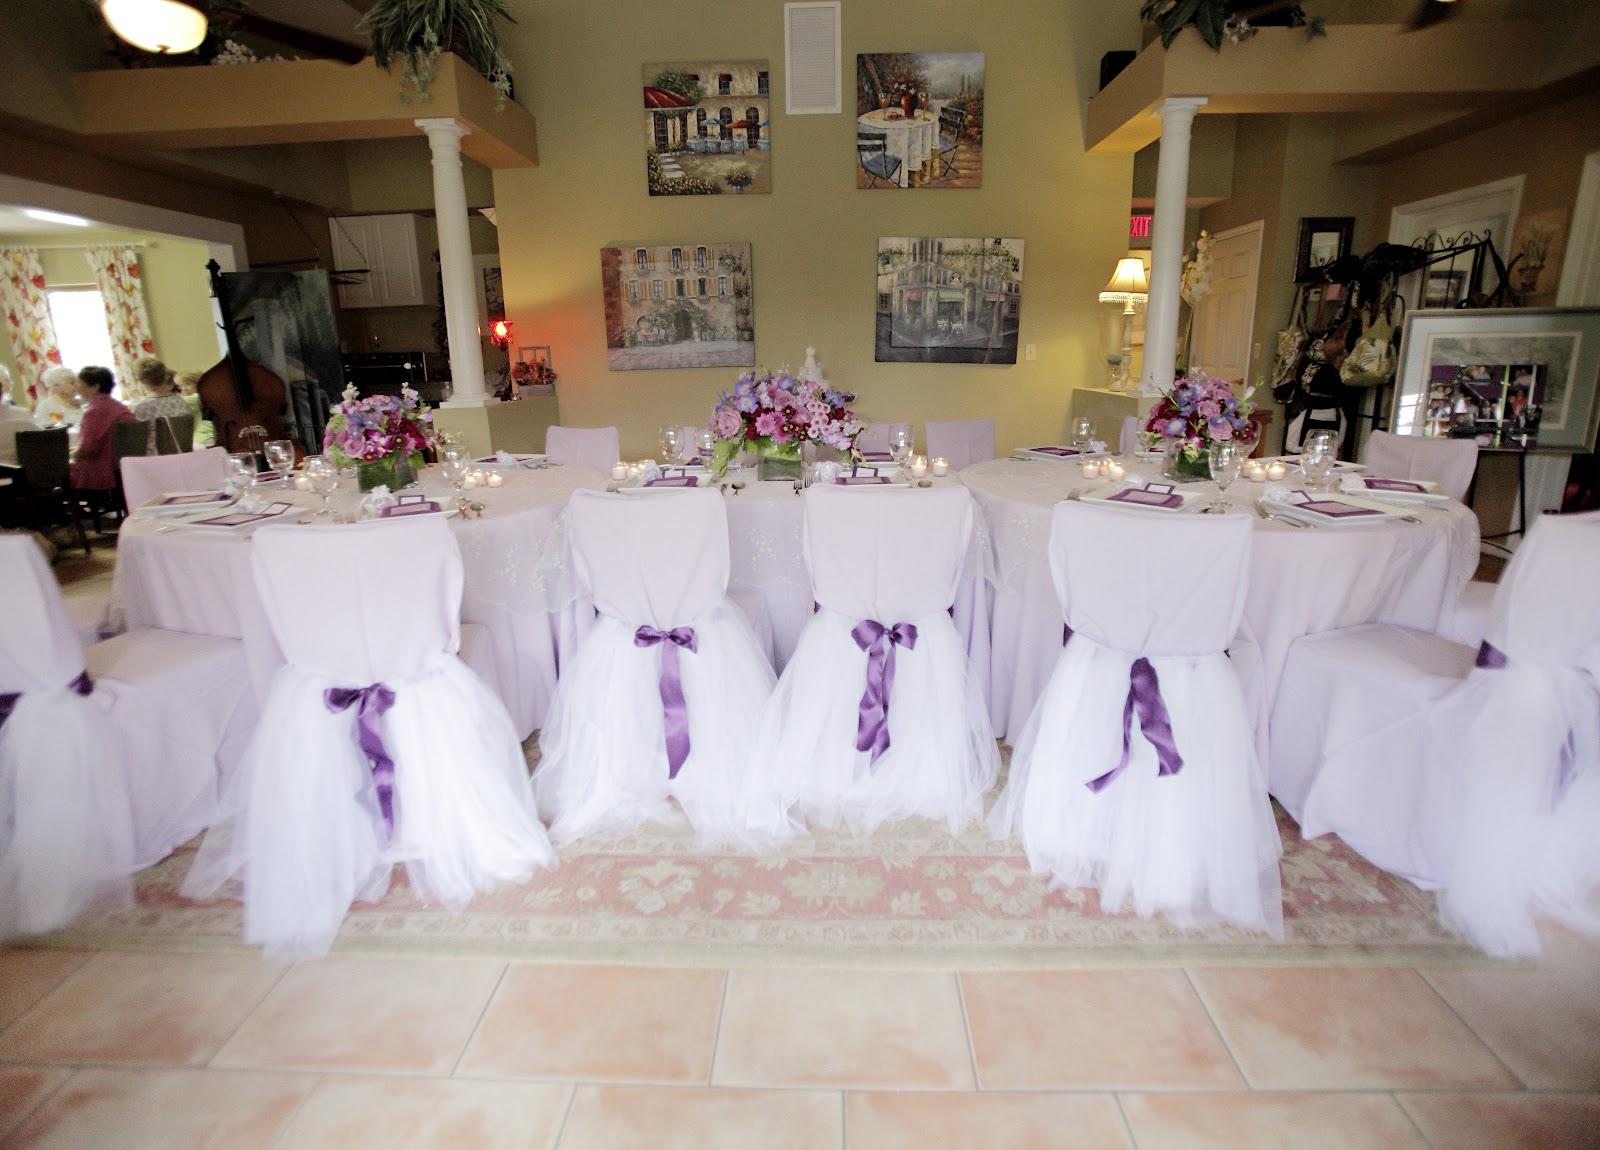 Tidbits on Weddings by Destination Planner u0026 Designer Kelly McWilliams: A Pretty little purple